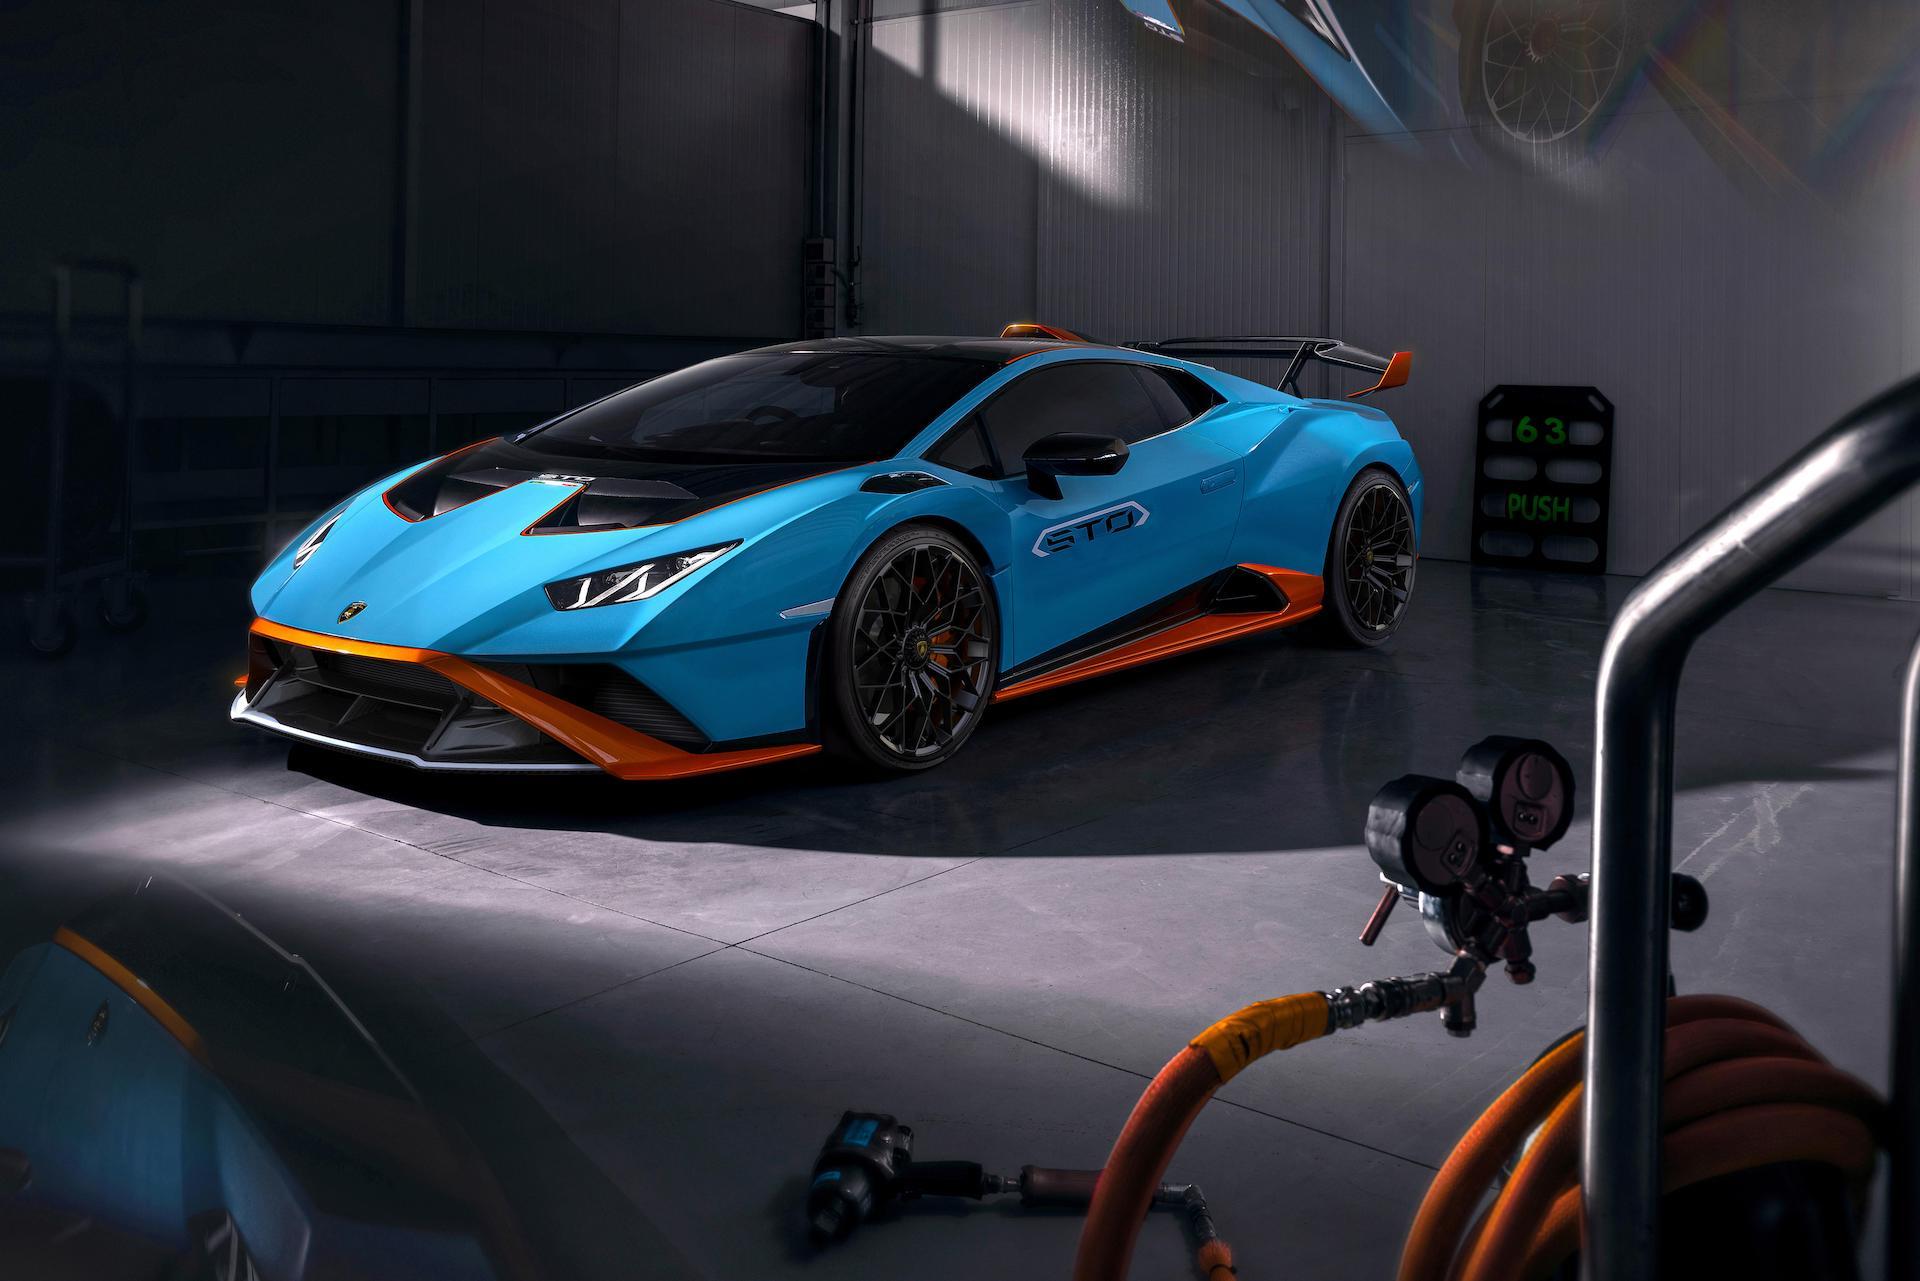 Der neue Lamborghini STO: Die Inkarnation des Squadra Corse-Erbes 7